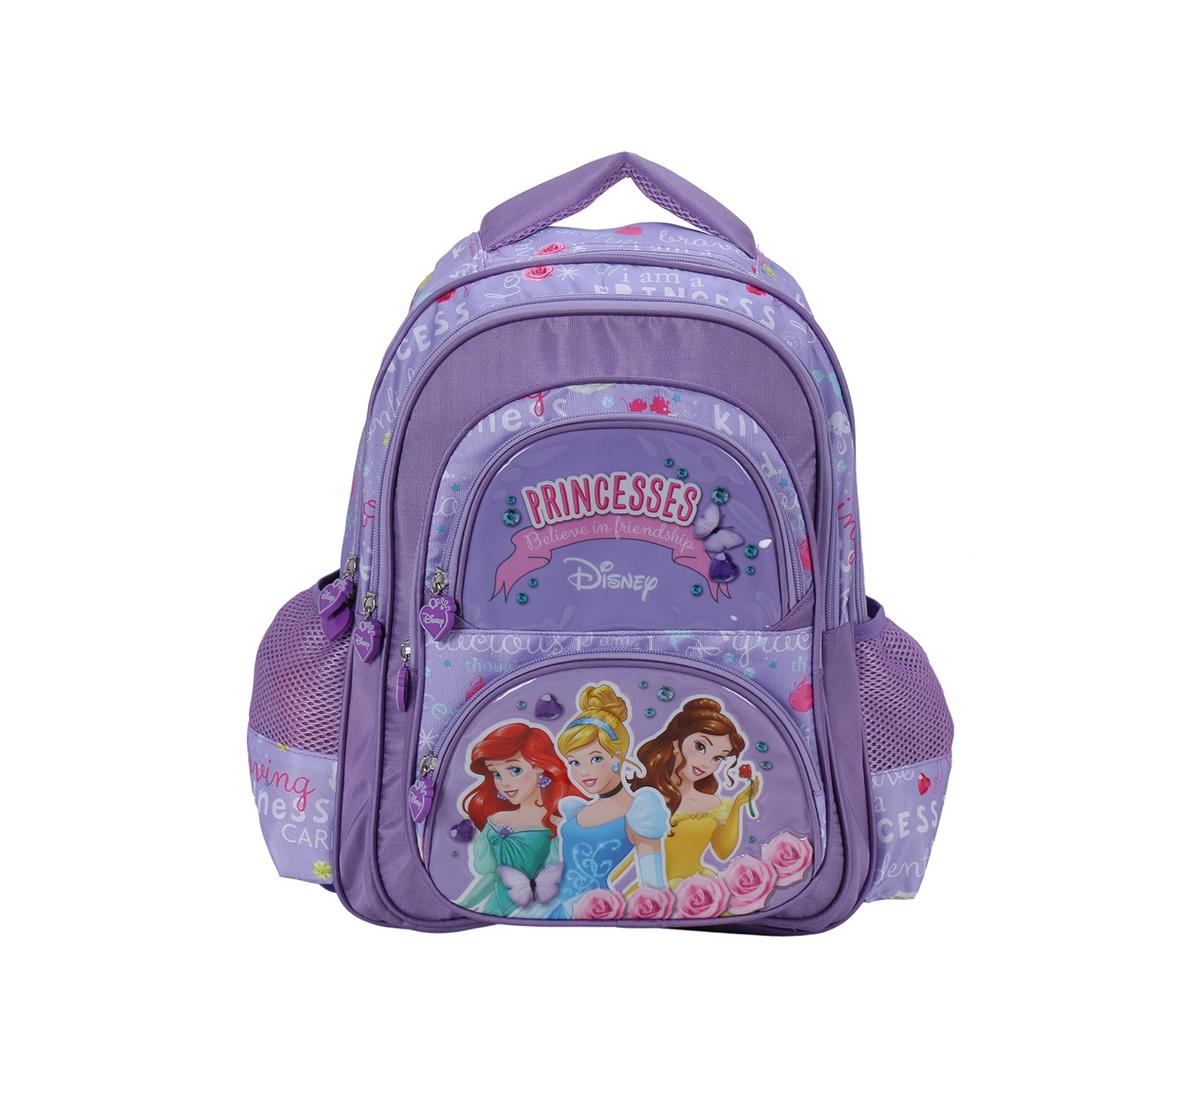 "Disney | Disney Princess Believe In Friendship 16"" Backpack Bags for Girls age 3Y+"